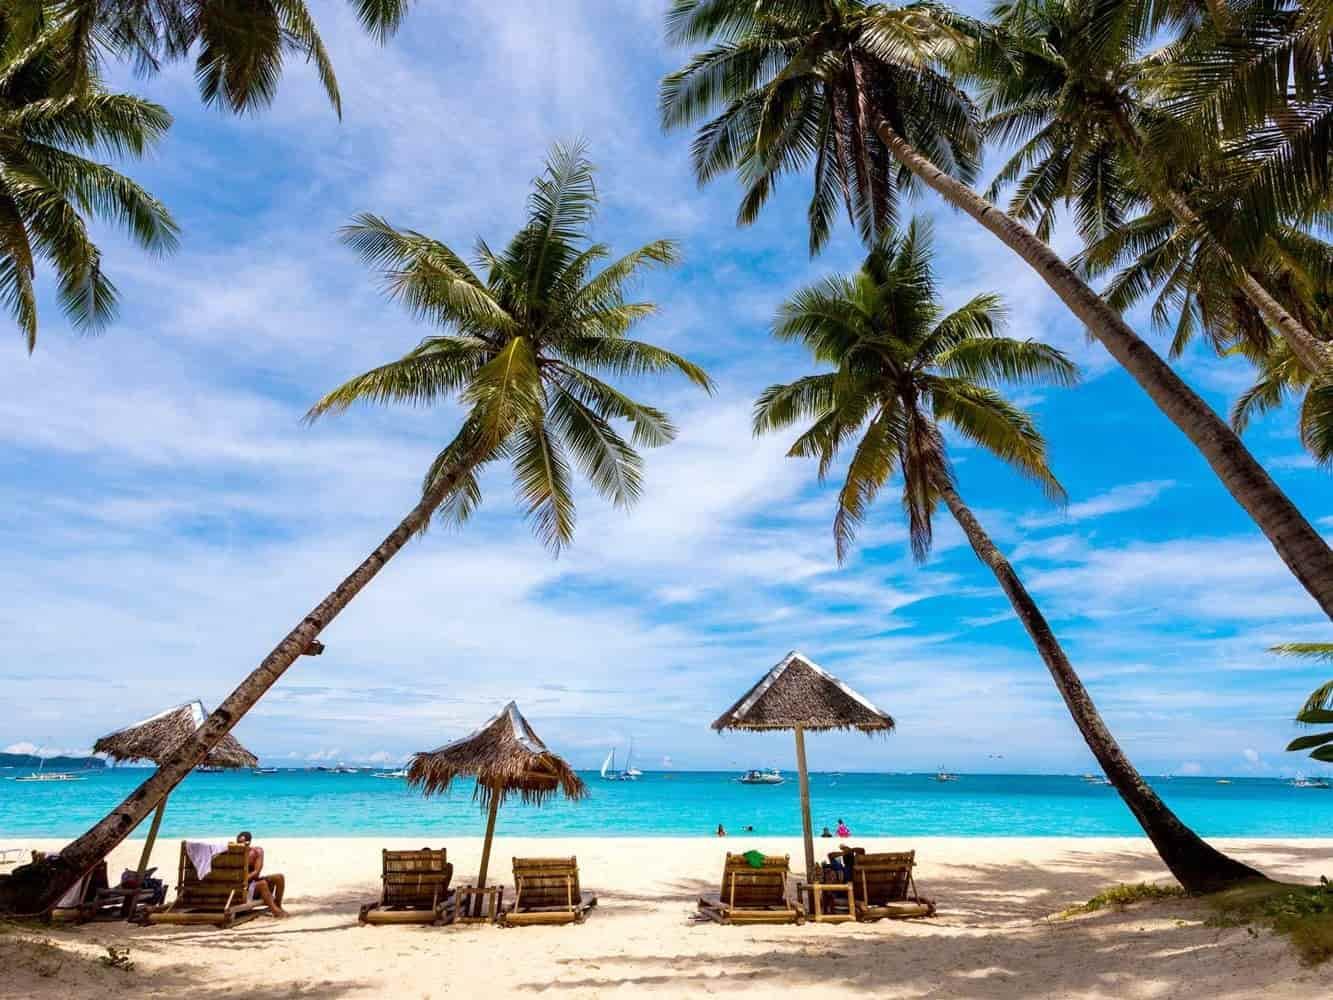 Philippines Beaches